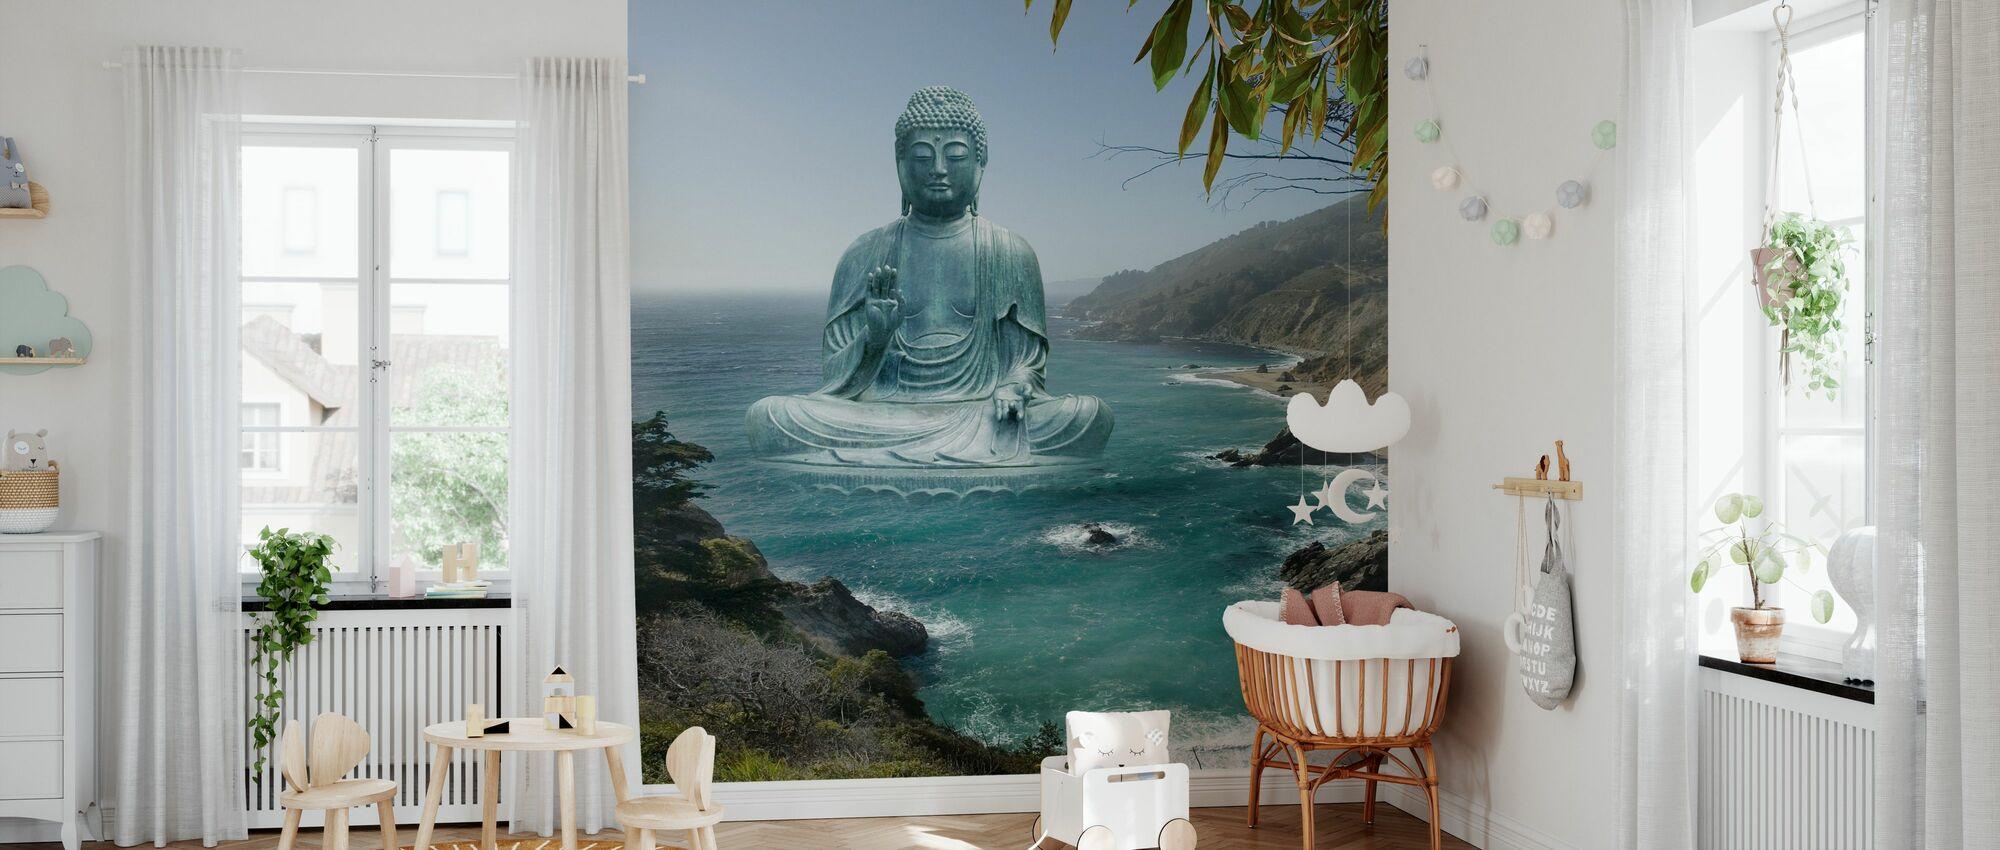 Store Sur te haven Buddha - Tapet - Babyværelse